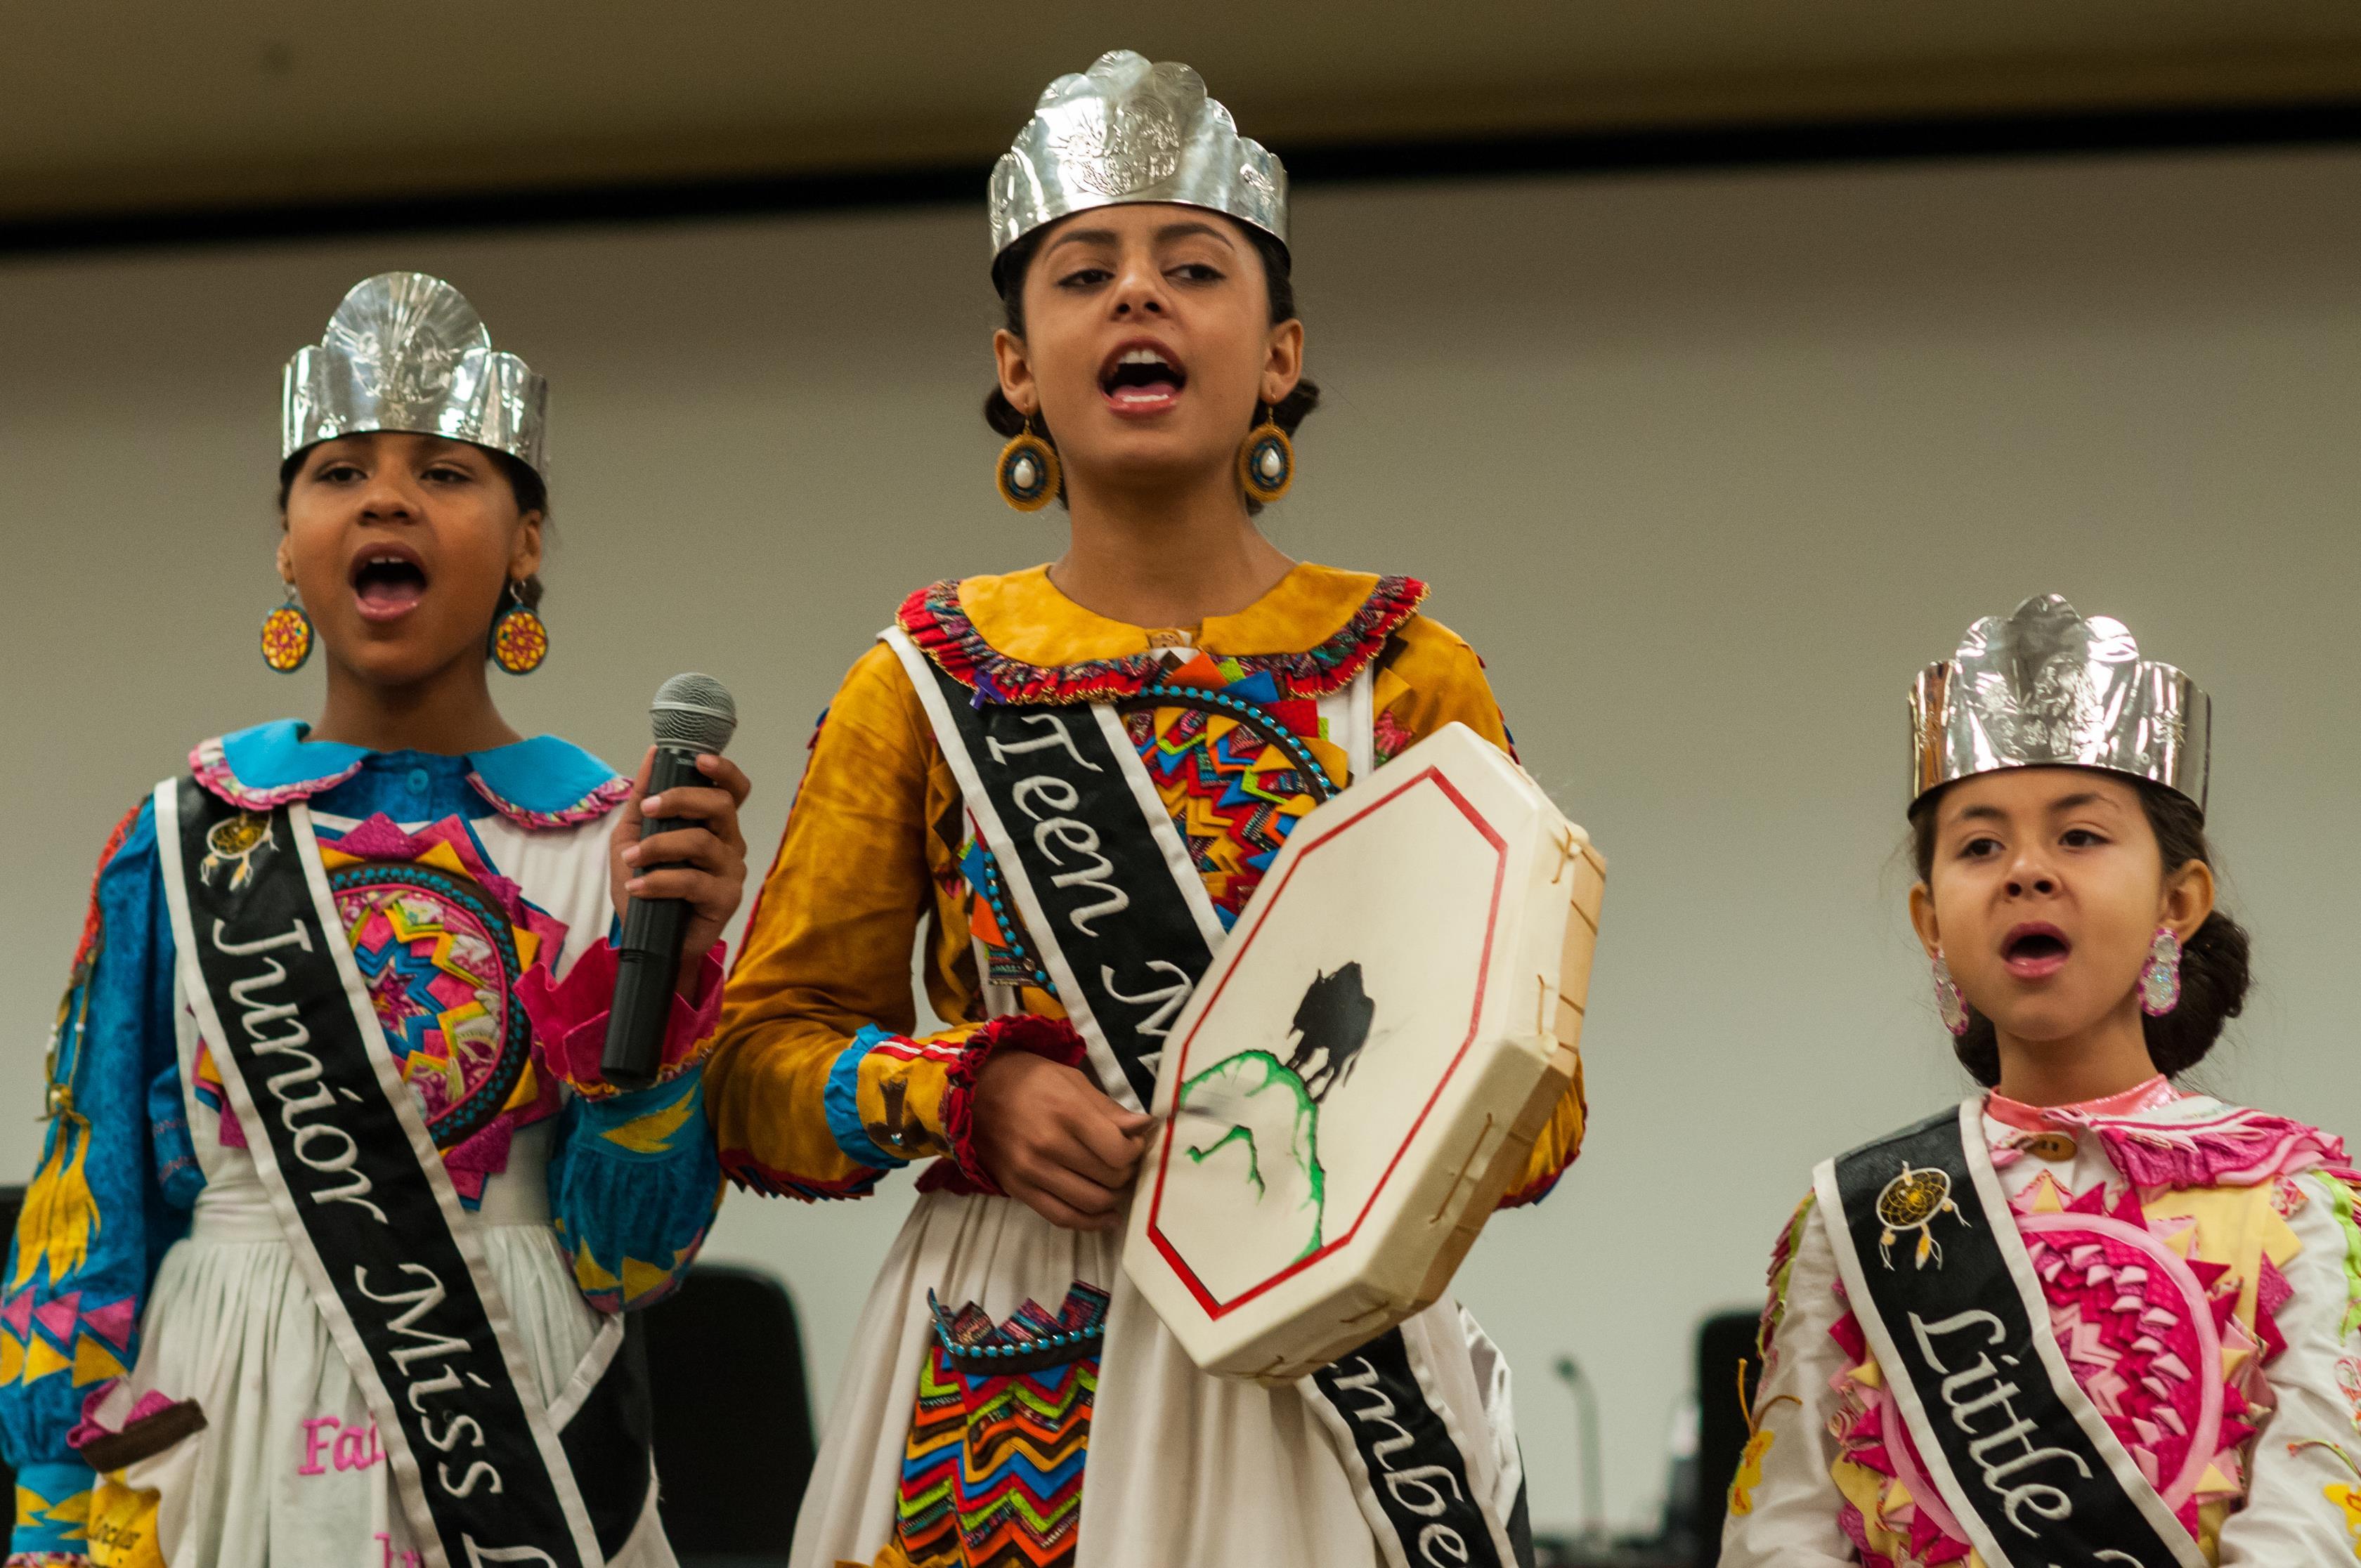 FORSCOM/USARC hosts National American Indian Heritage event